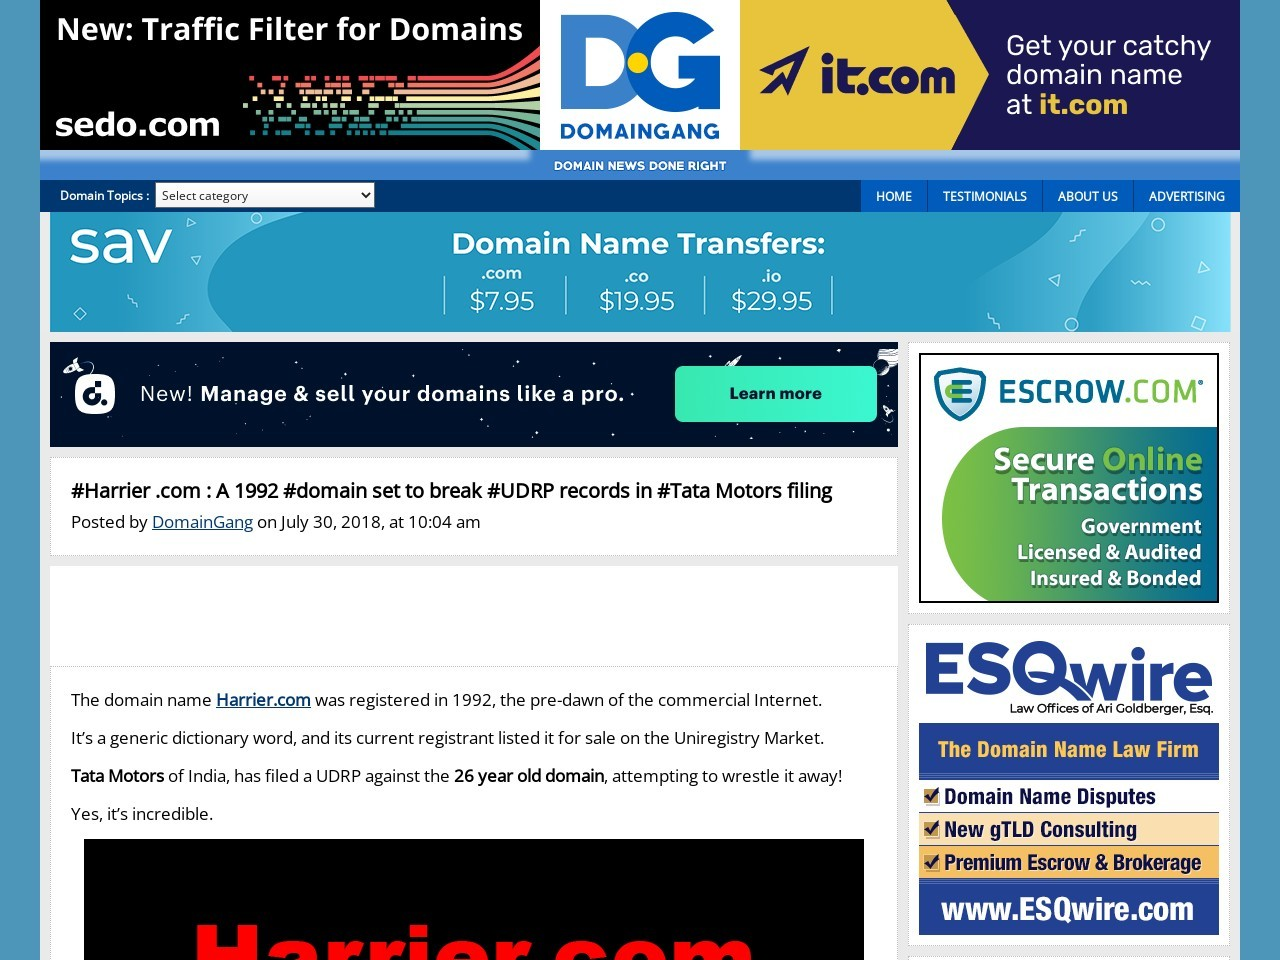 #Harrier .com : A 1992 #domain set to break #UDRP records in #Tata Motors filing